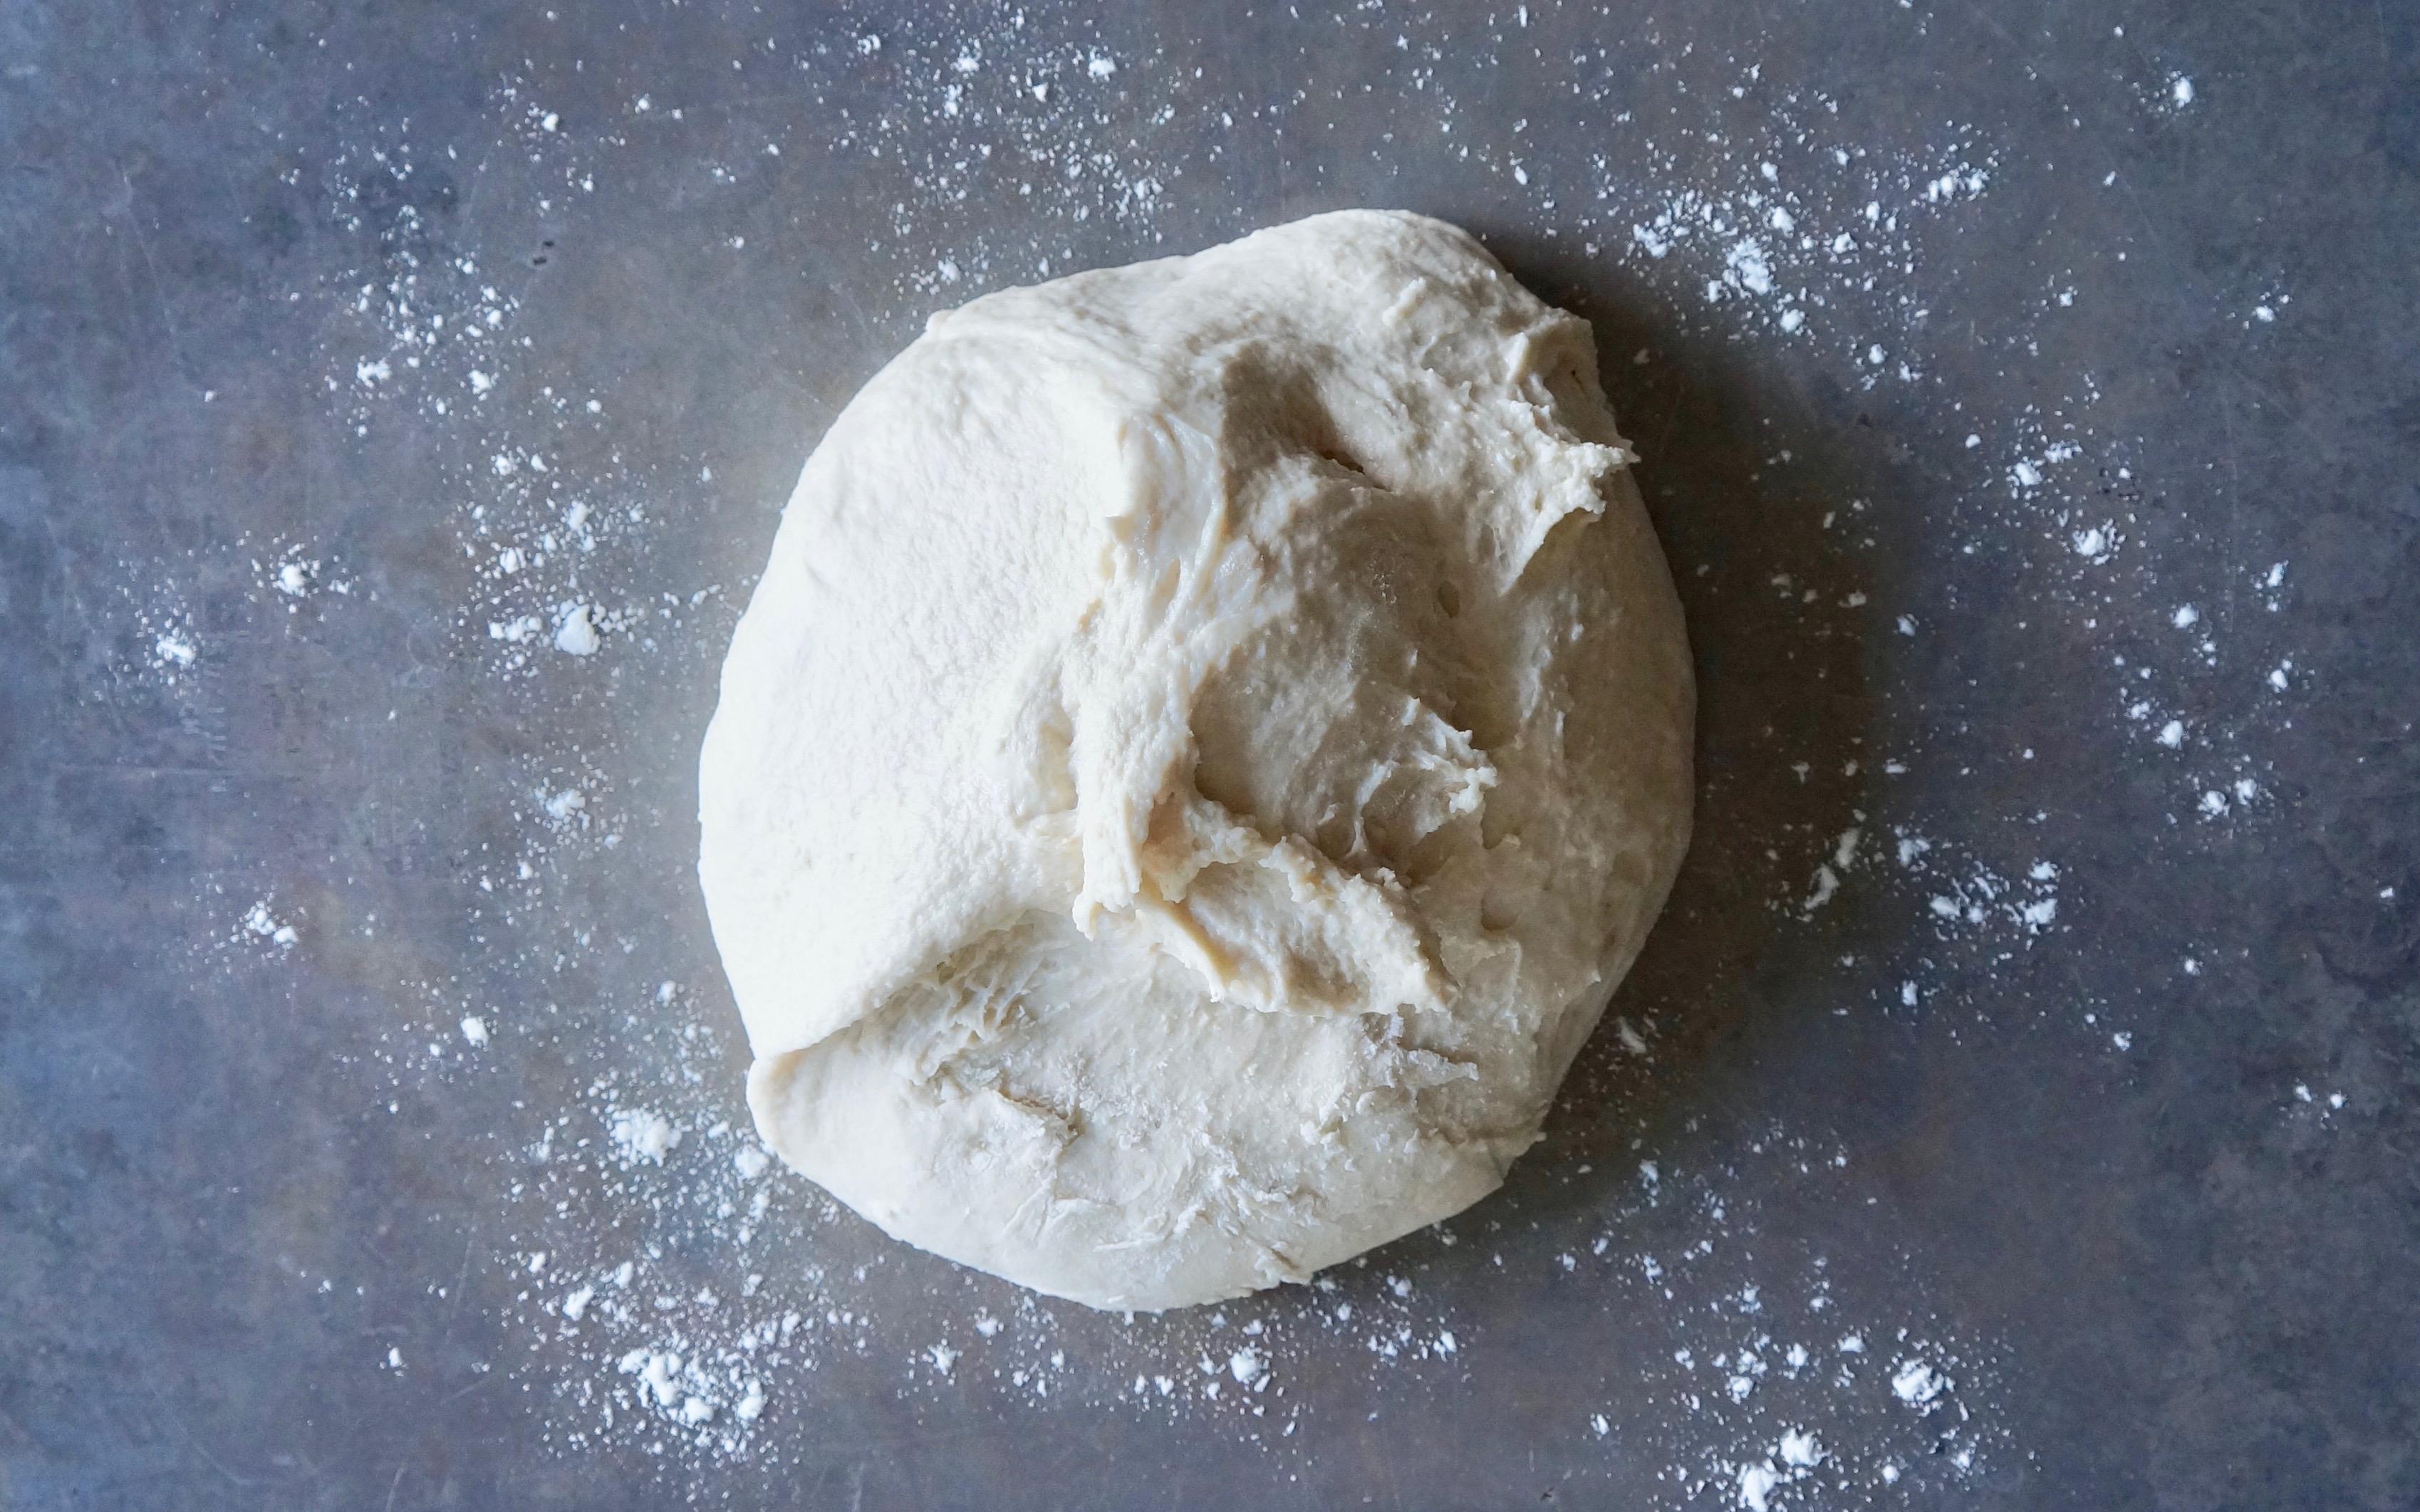 Buttermilk-Telera-Rolls-Rebecca-Gordon-Editor-In-Chief-Buttermilk-Lipstick-Culinary-Entertaining-Techniques-Southern-Entertaining-RebeccaGordon-Pastry-Chef-Birmingham-Alabama